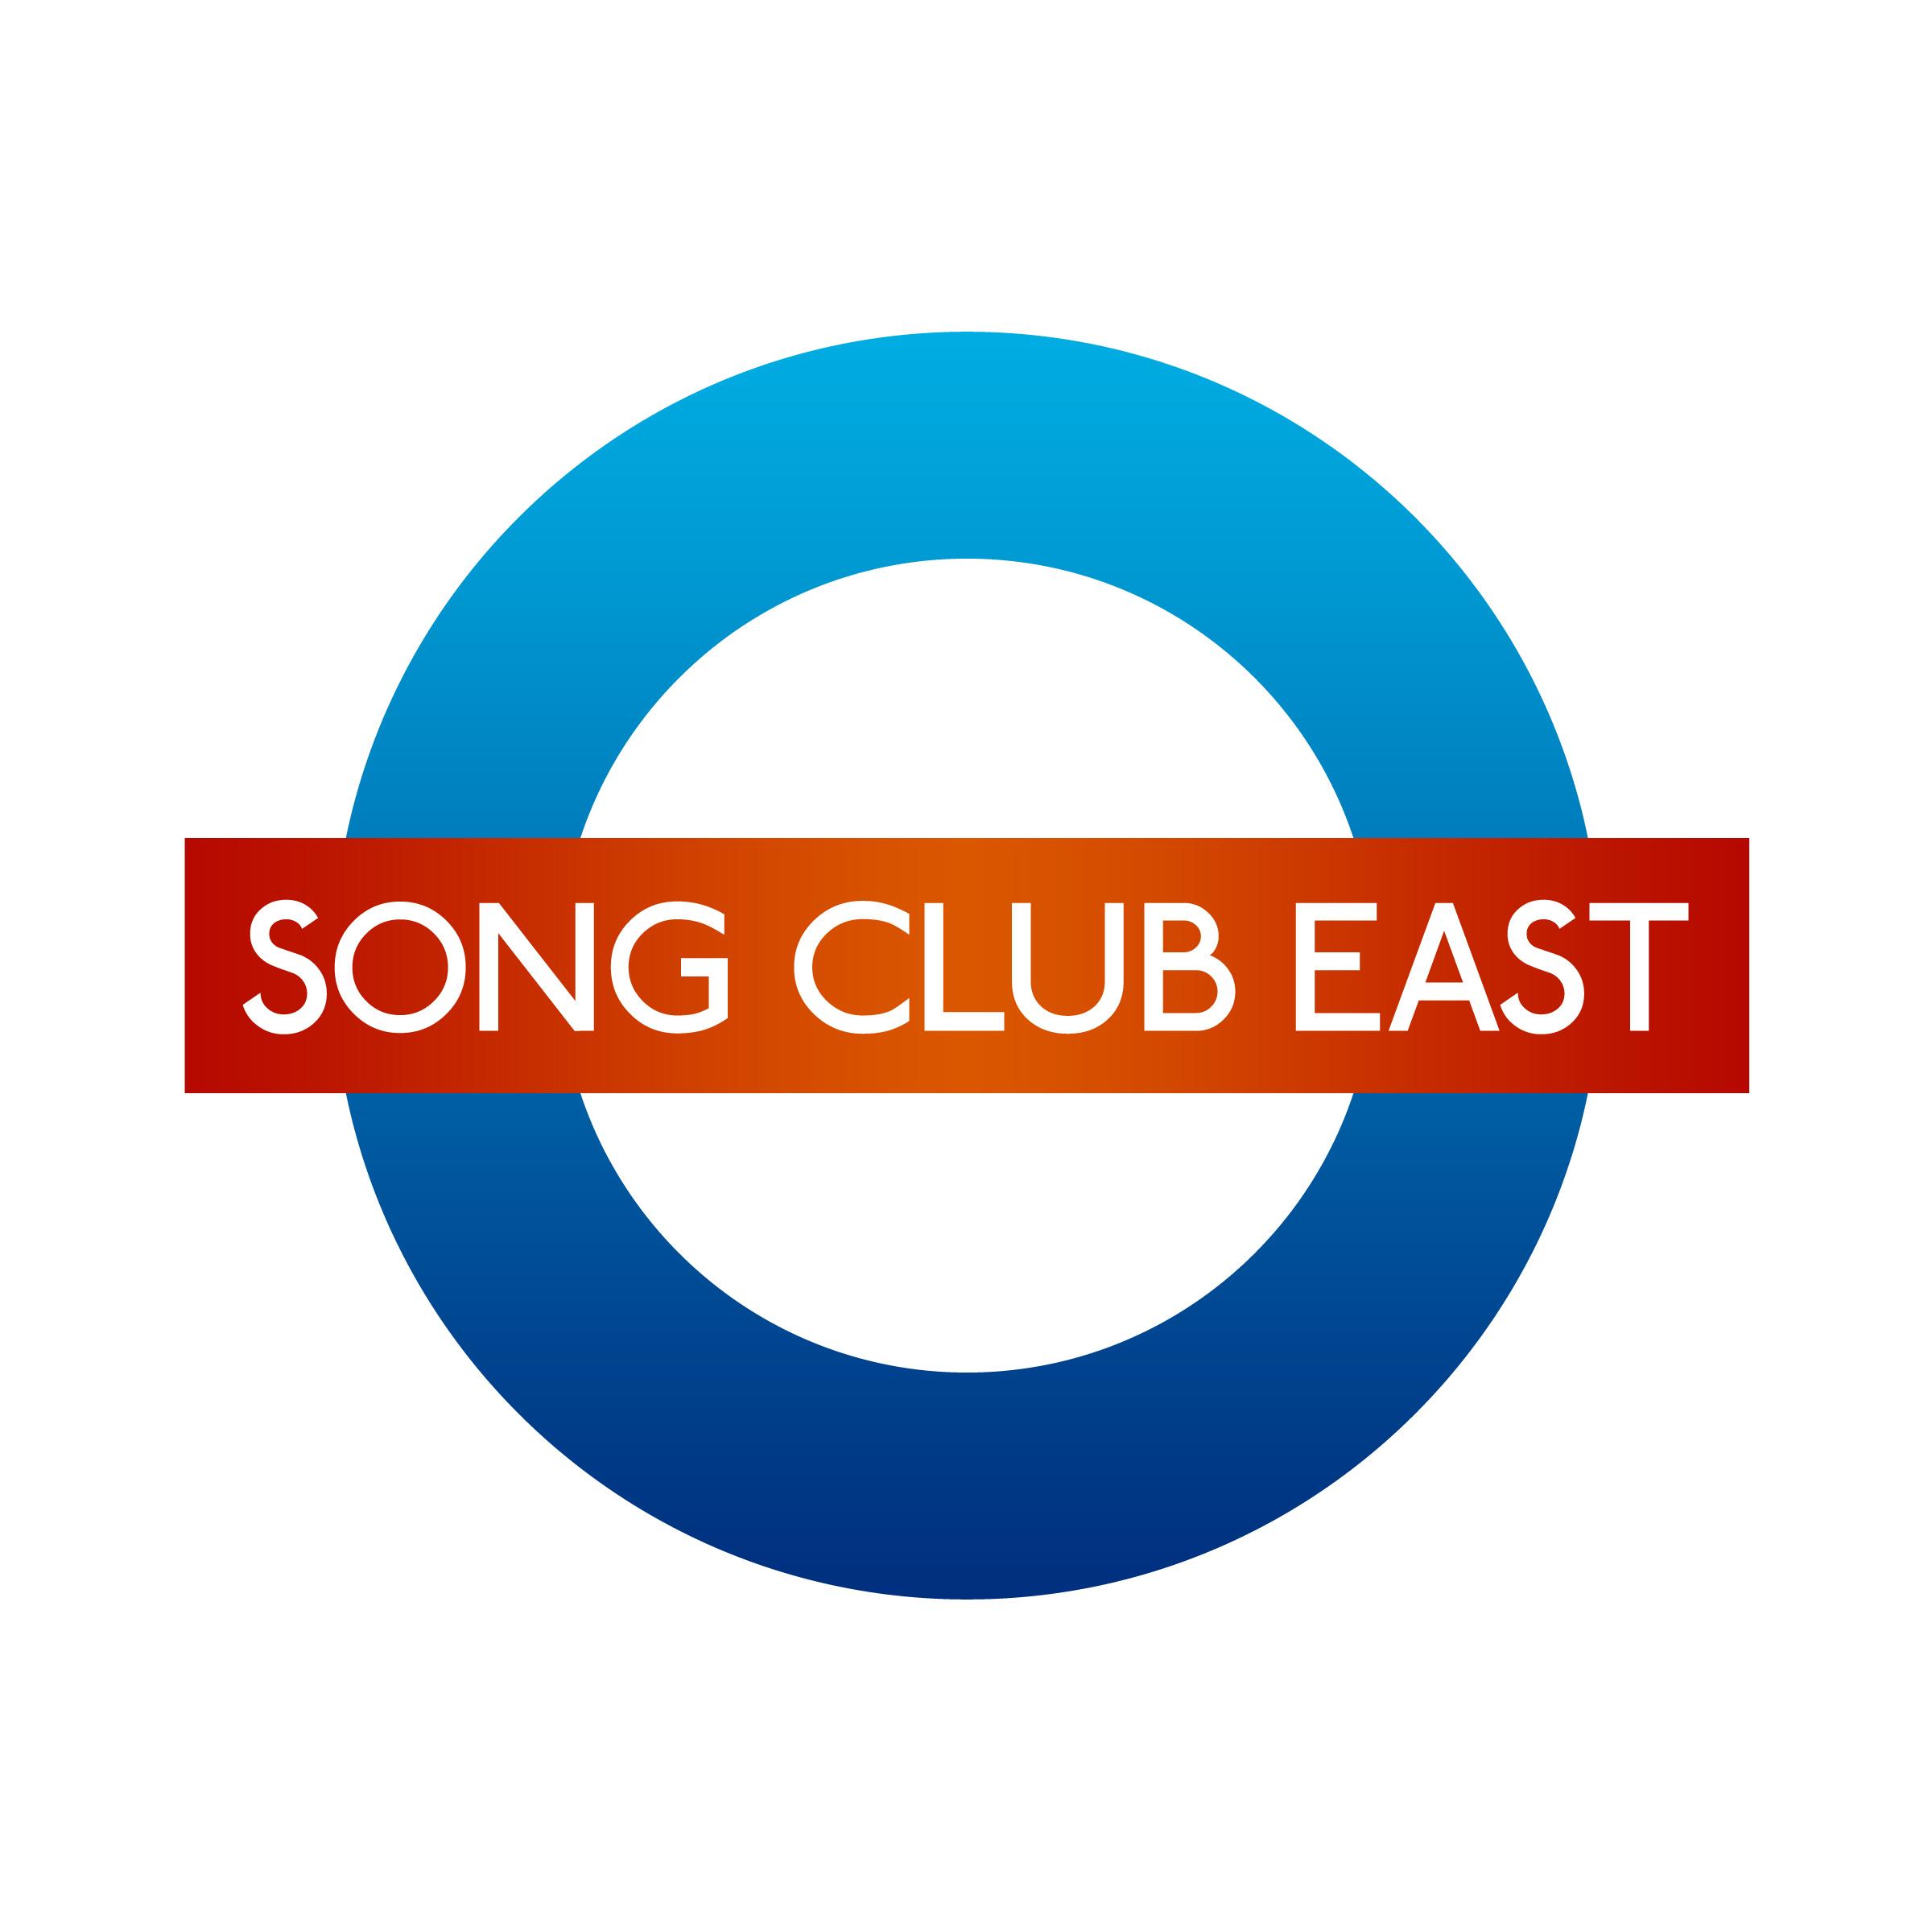 SongClubEast.jpg